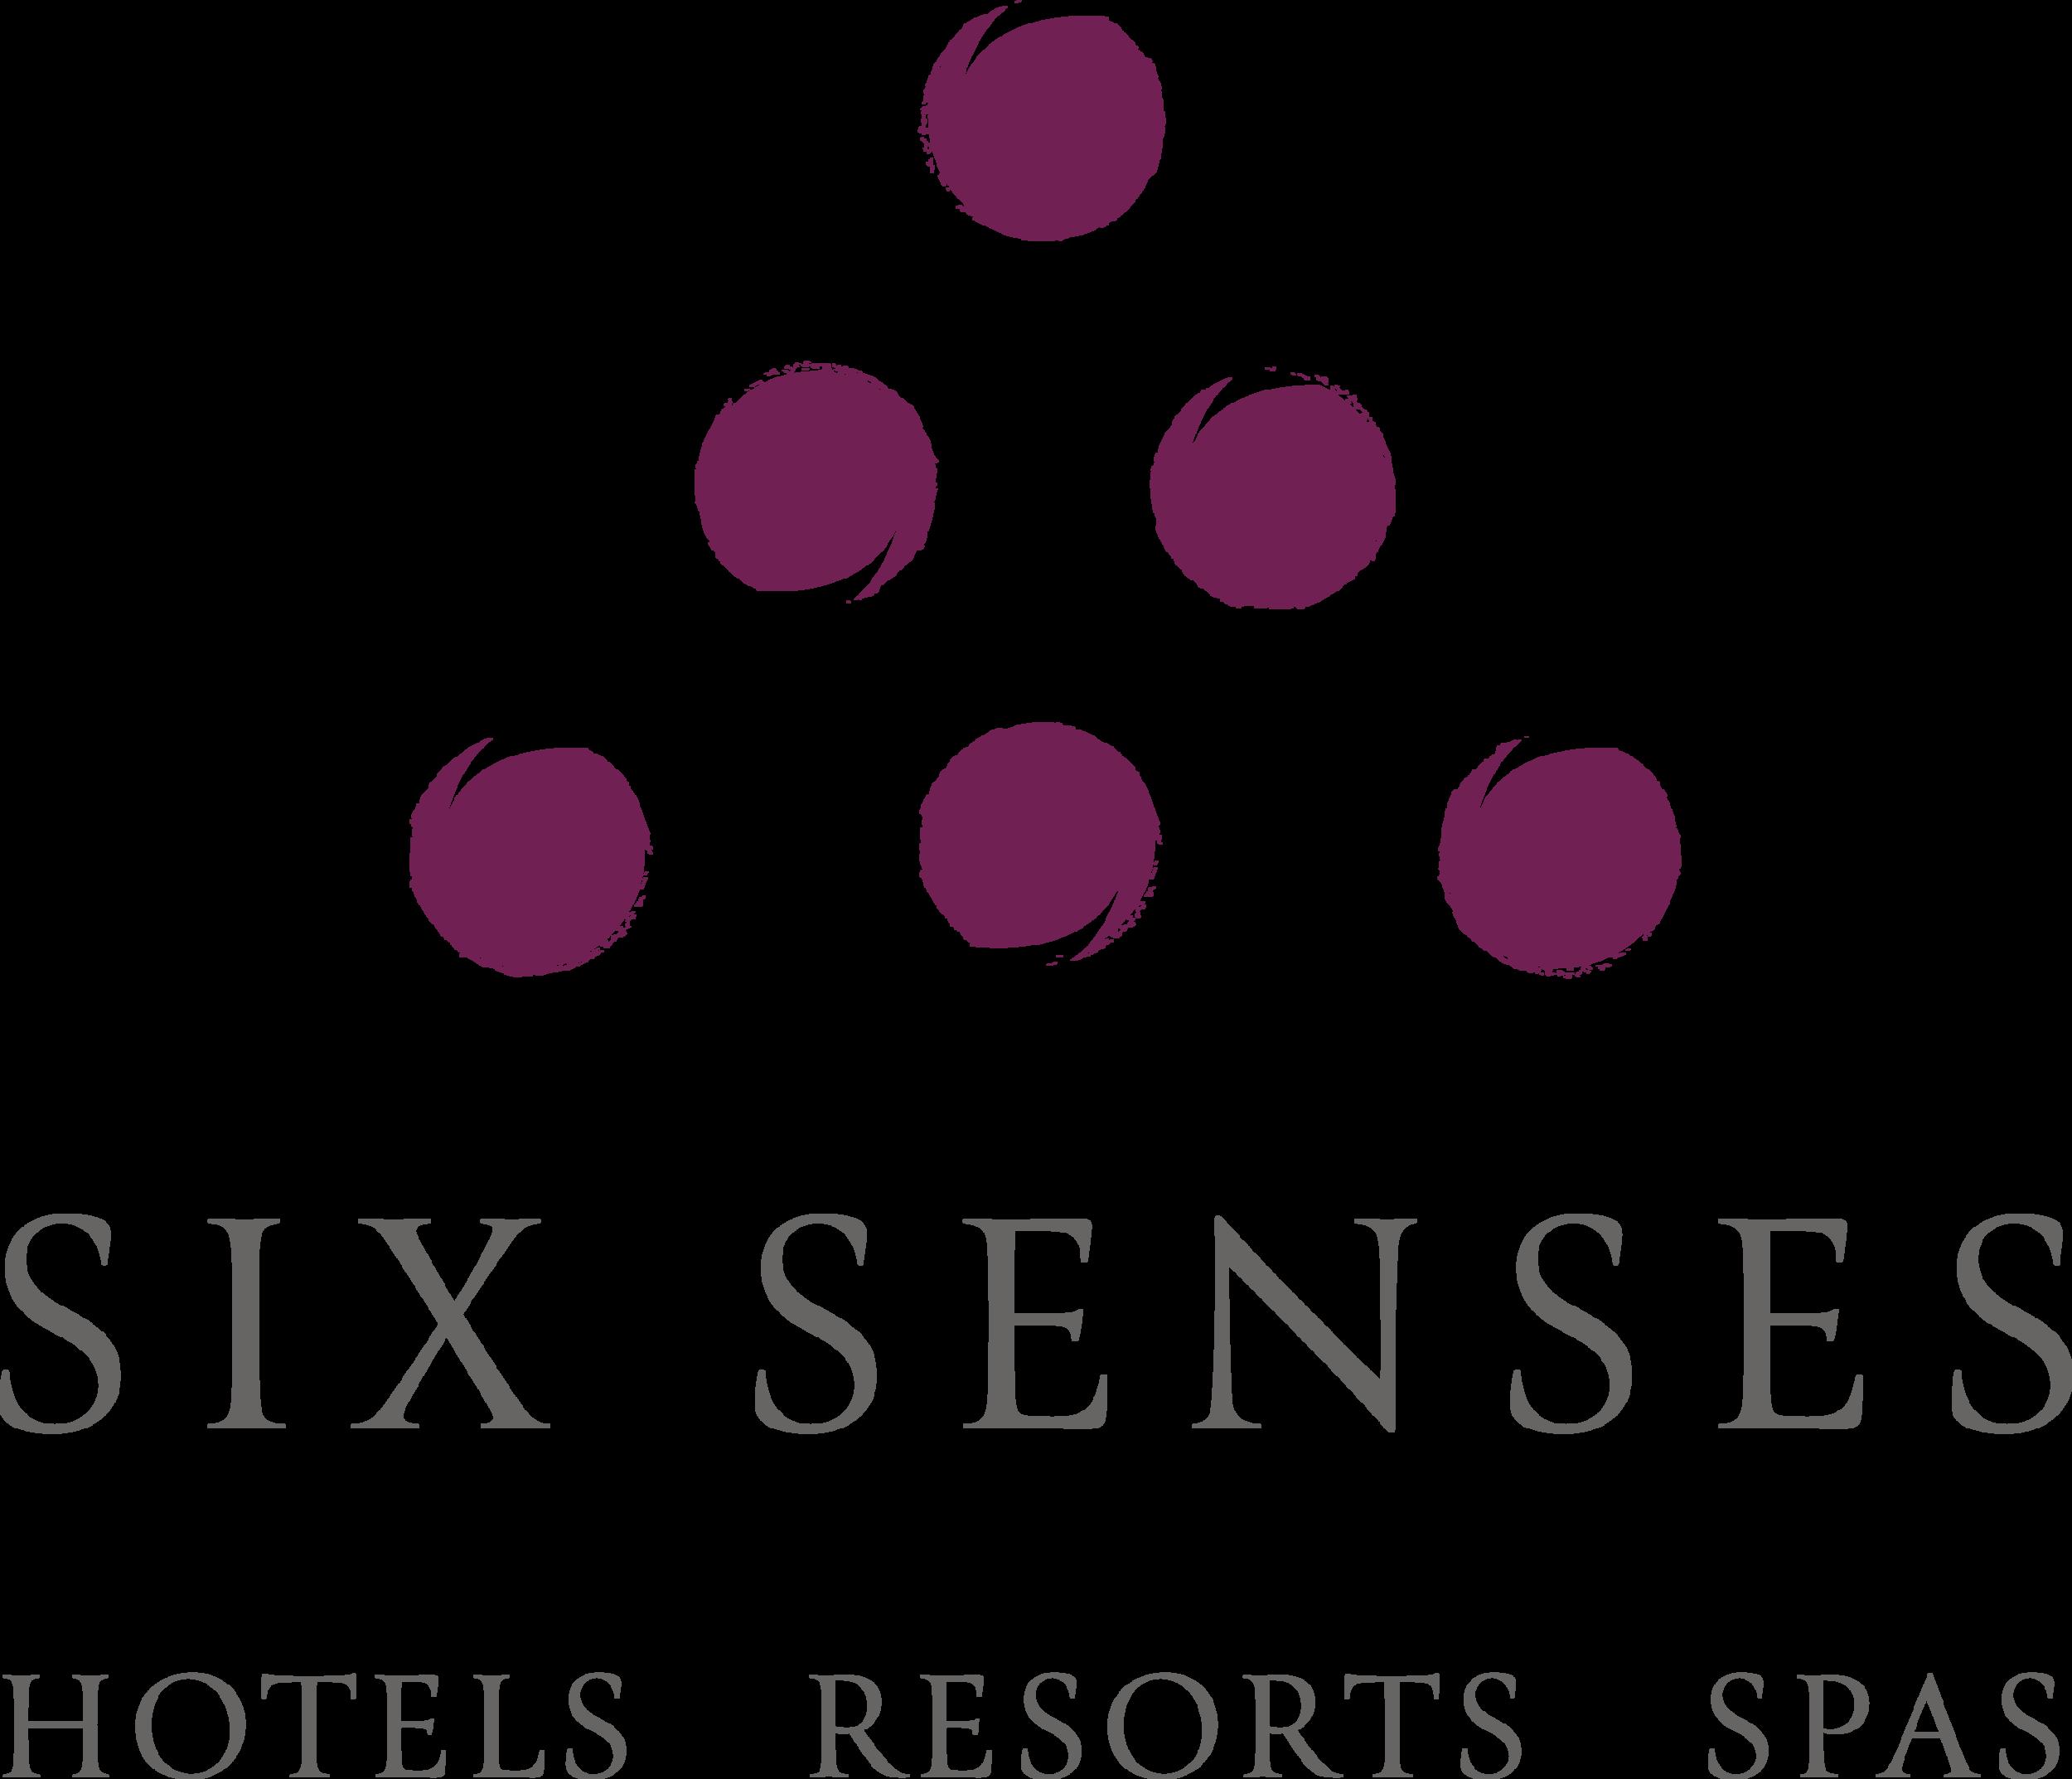 SS_BRAND_standard_logo.png